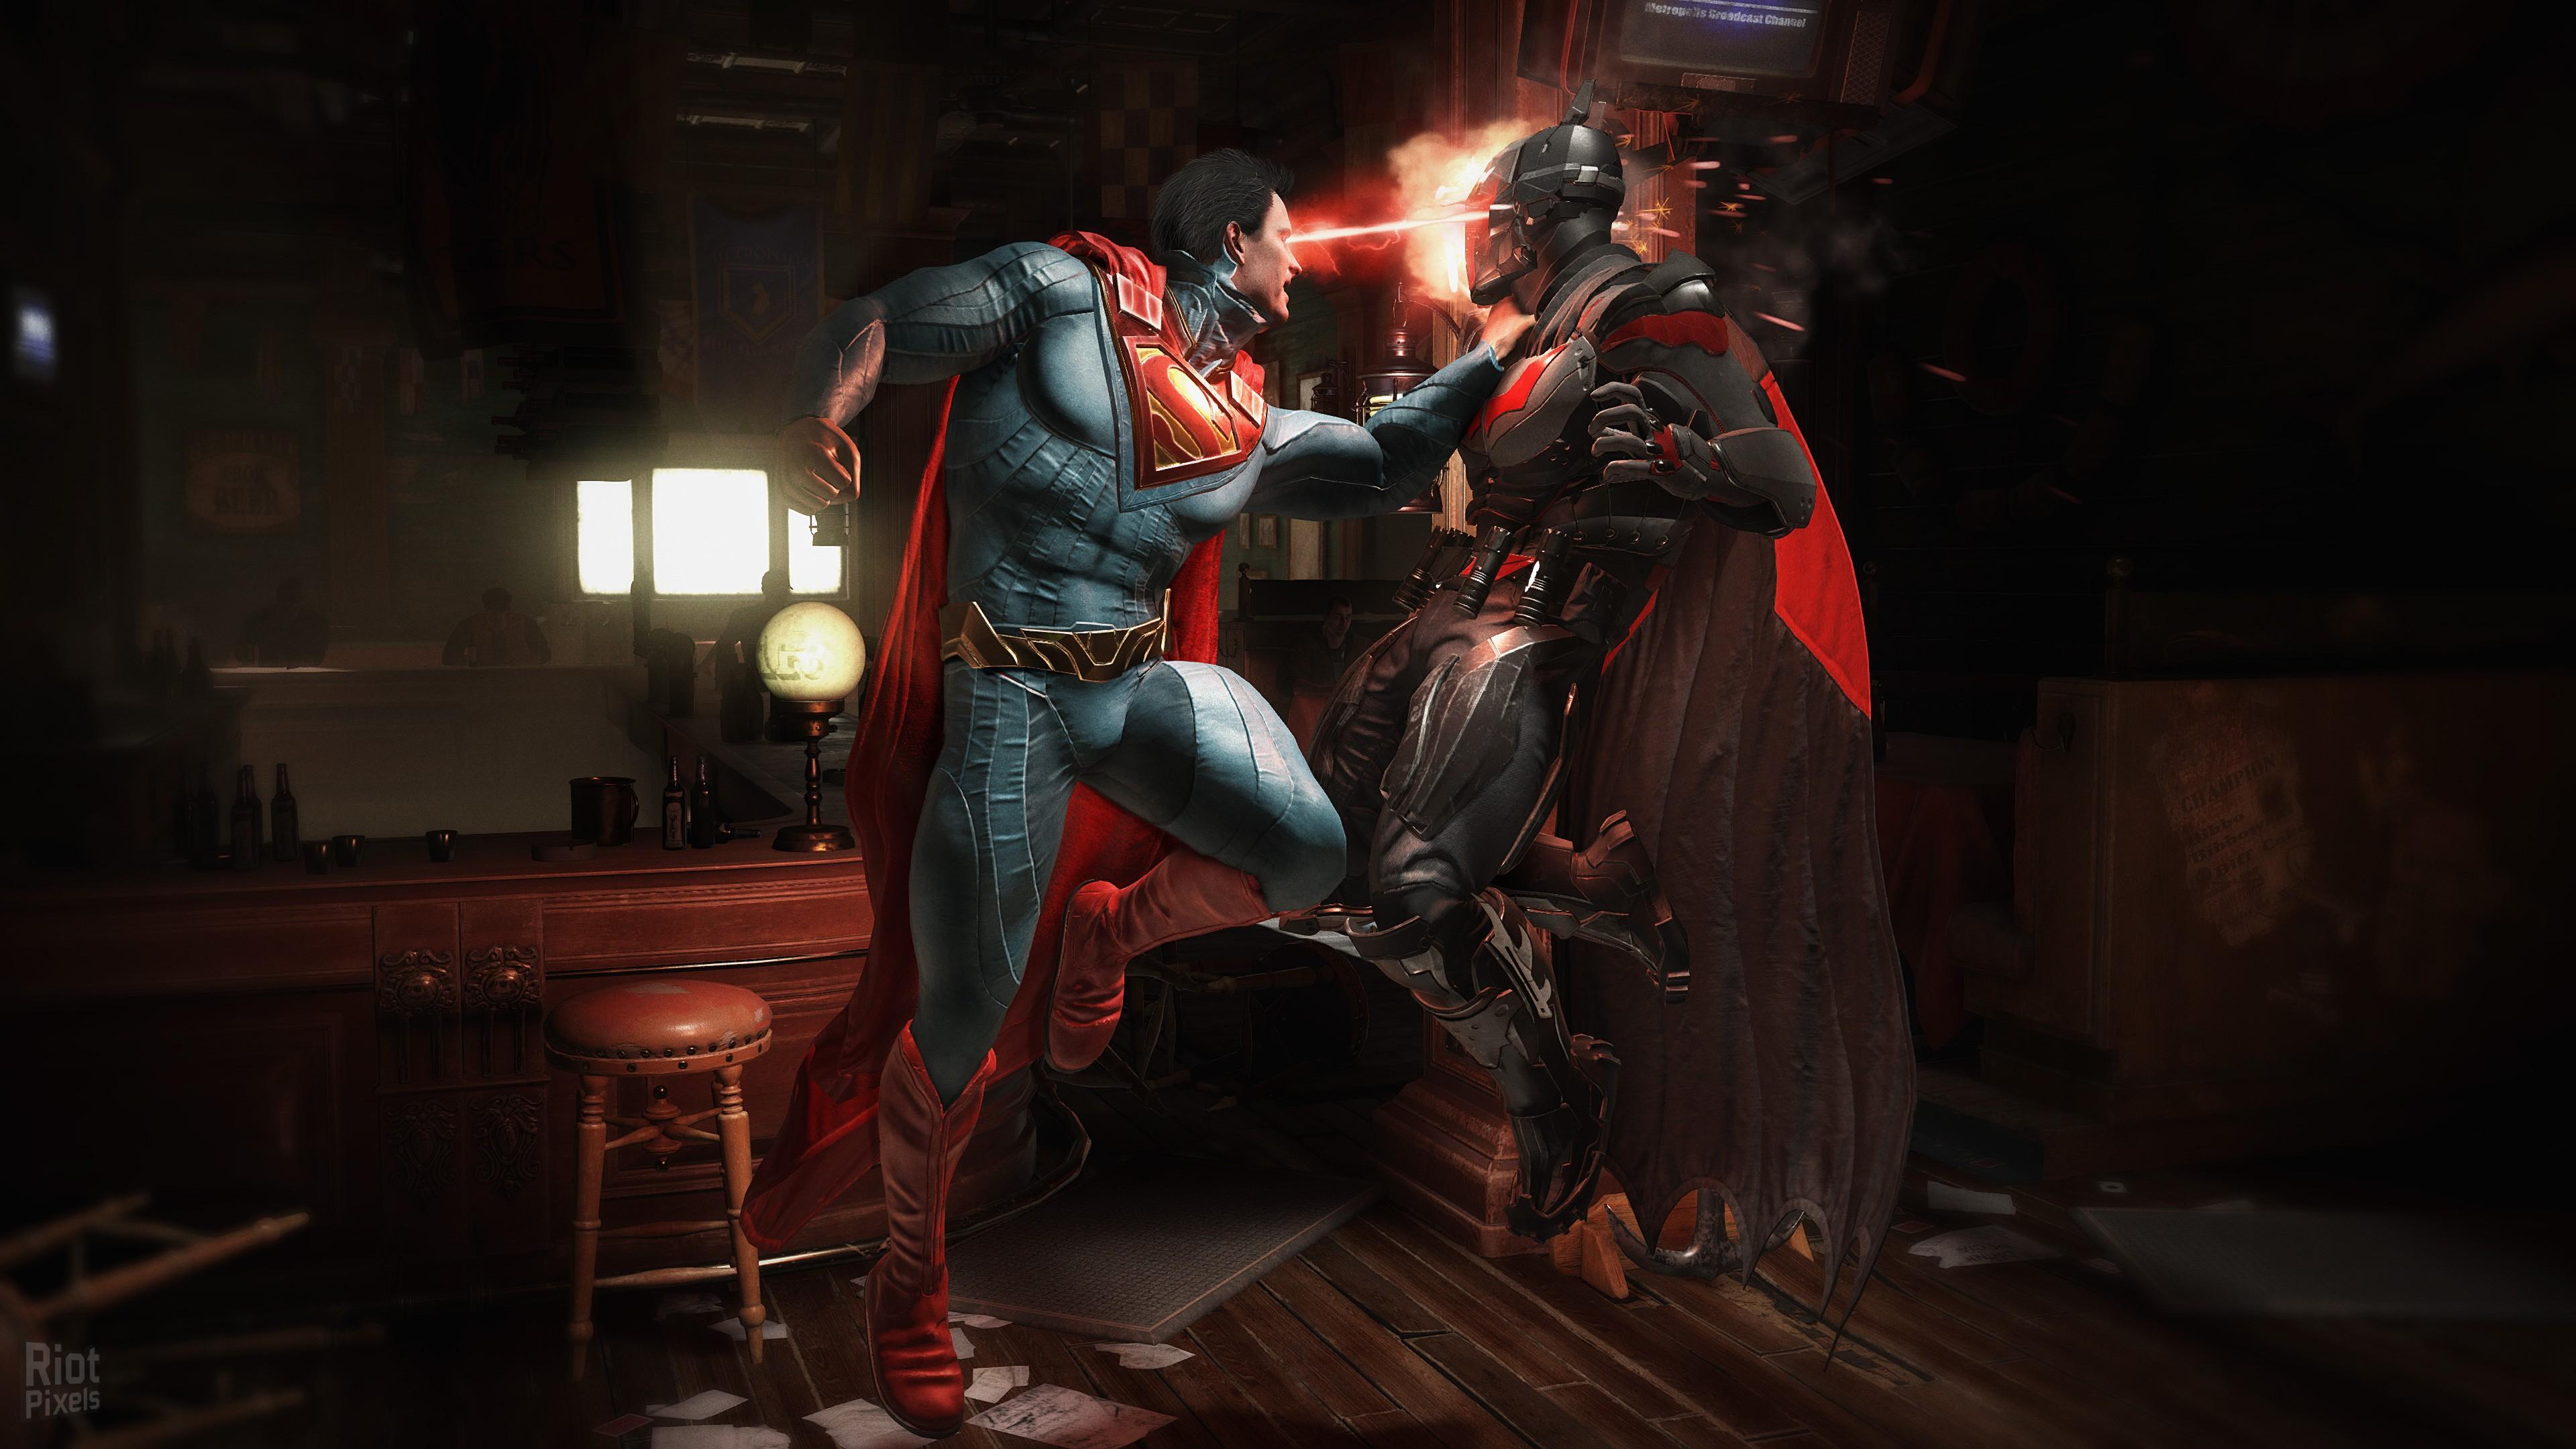 Wallpaper Injustice 2 Atrocitus Fighting Pc Playstation Ps4